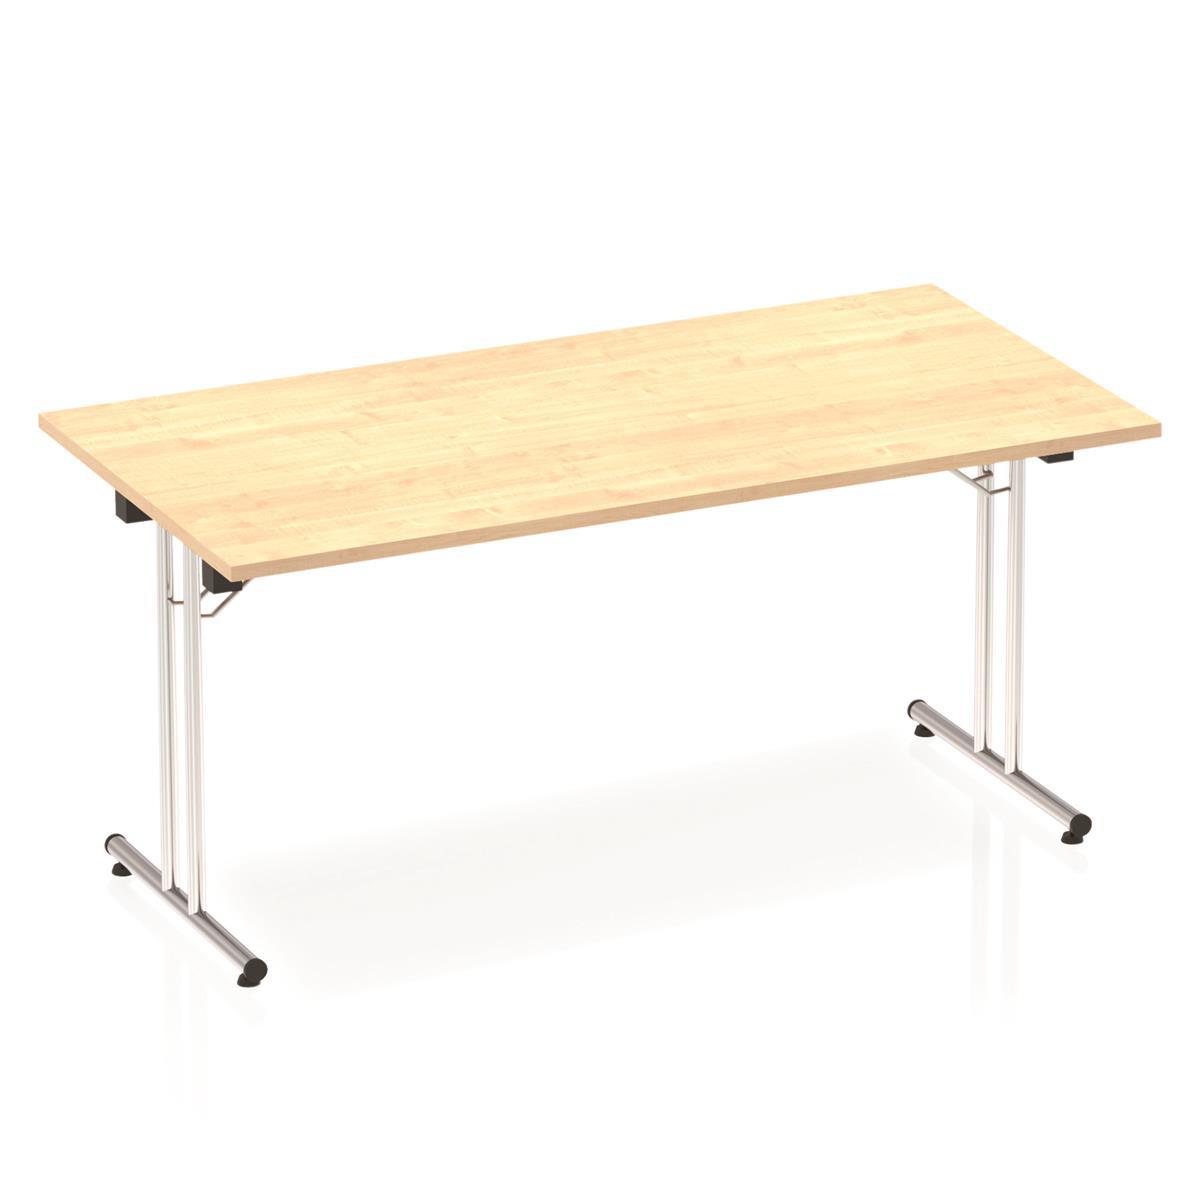 Sonix Rectangular Chrome Leg Folding Meeting Table 1600x800mm Maple Ref I000718